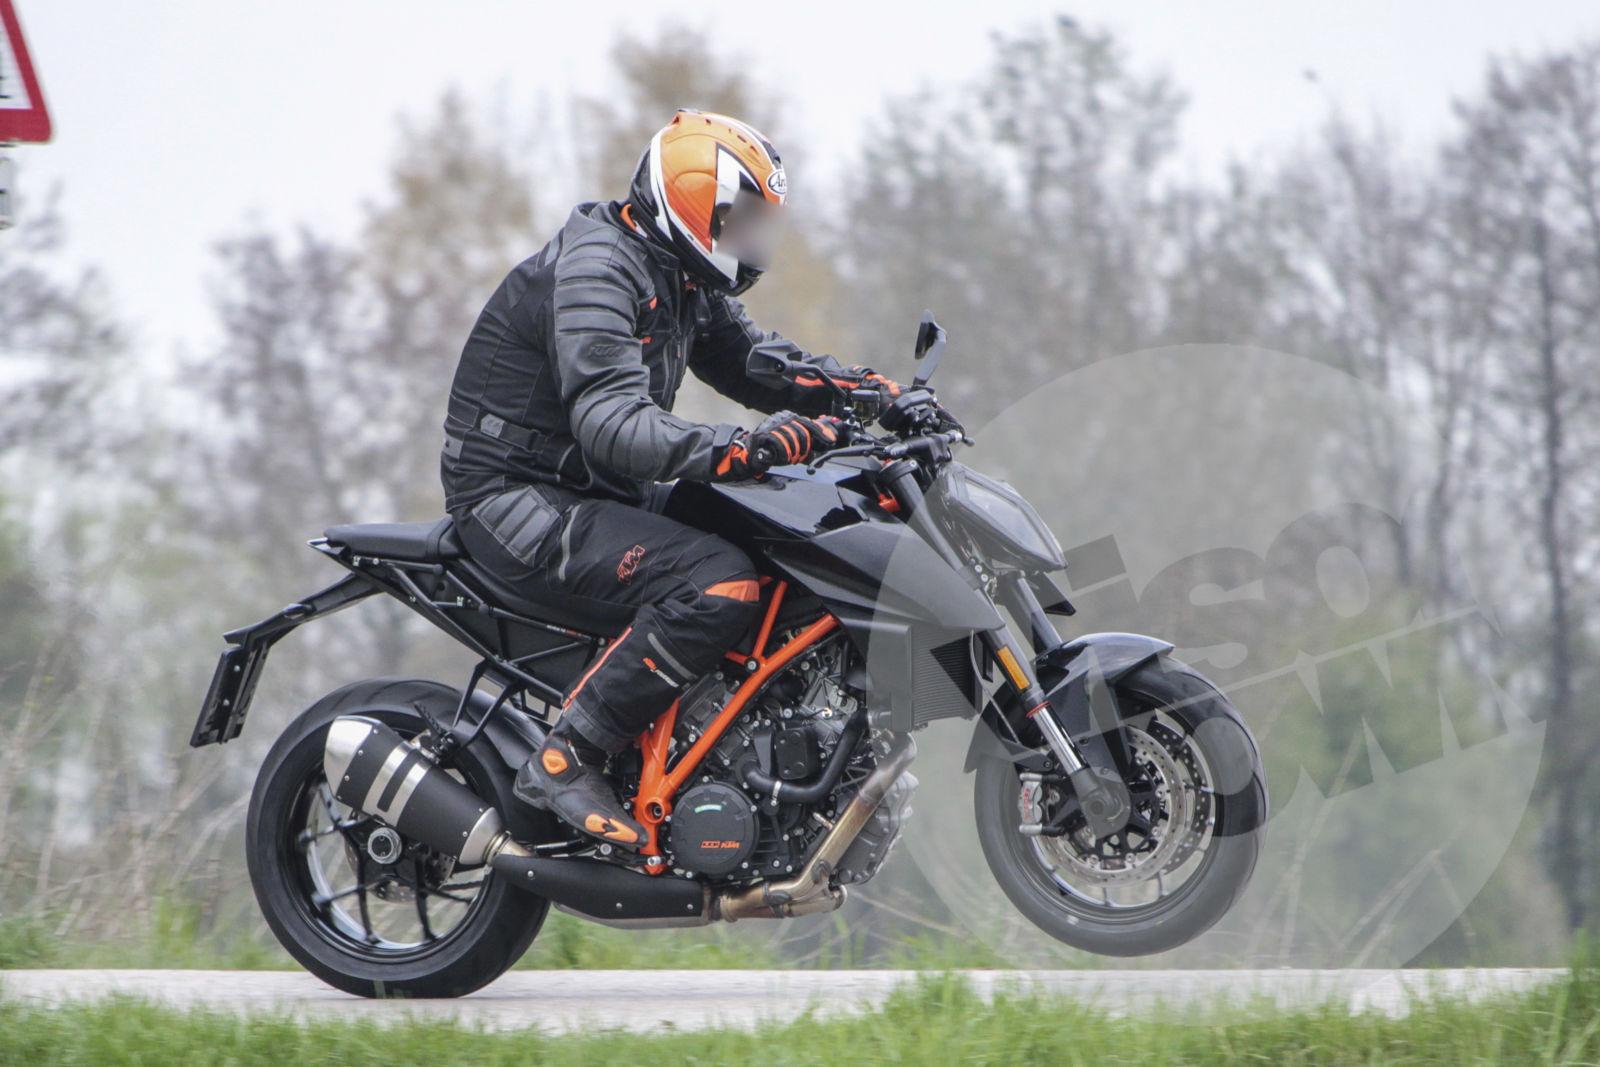 2017 KTM 1290 Super Duke R - Spy Image